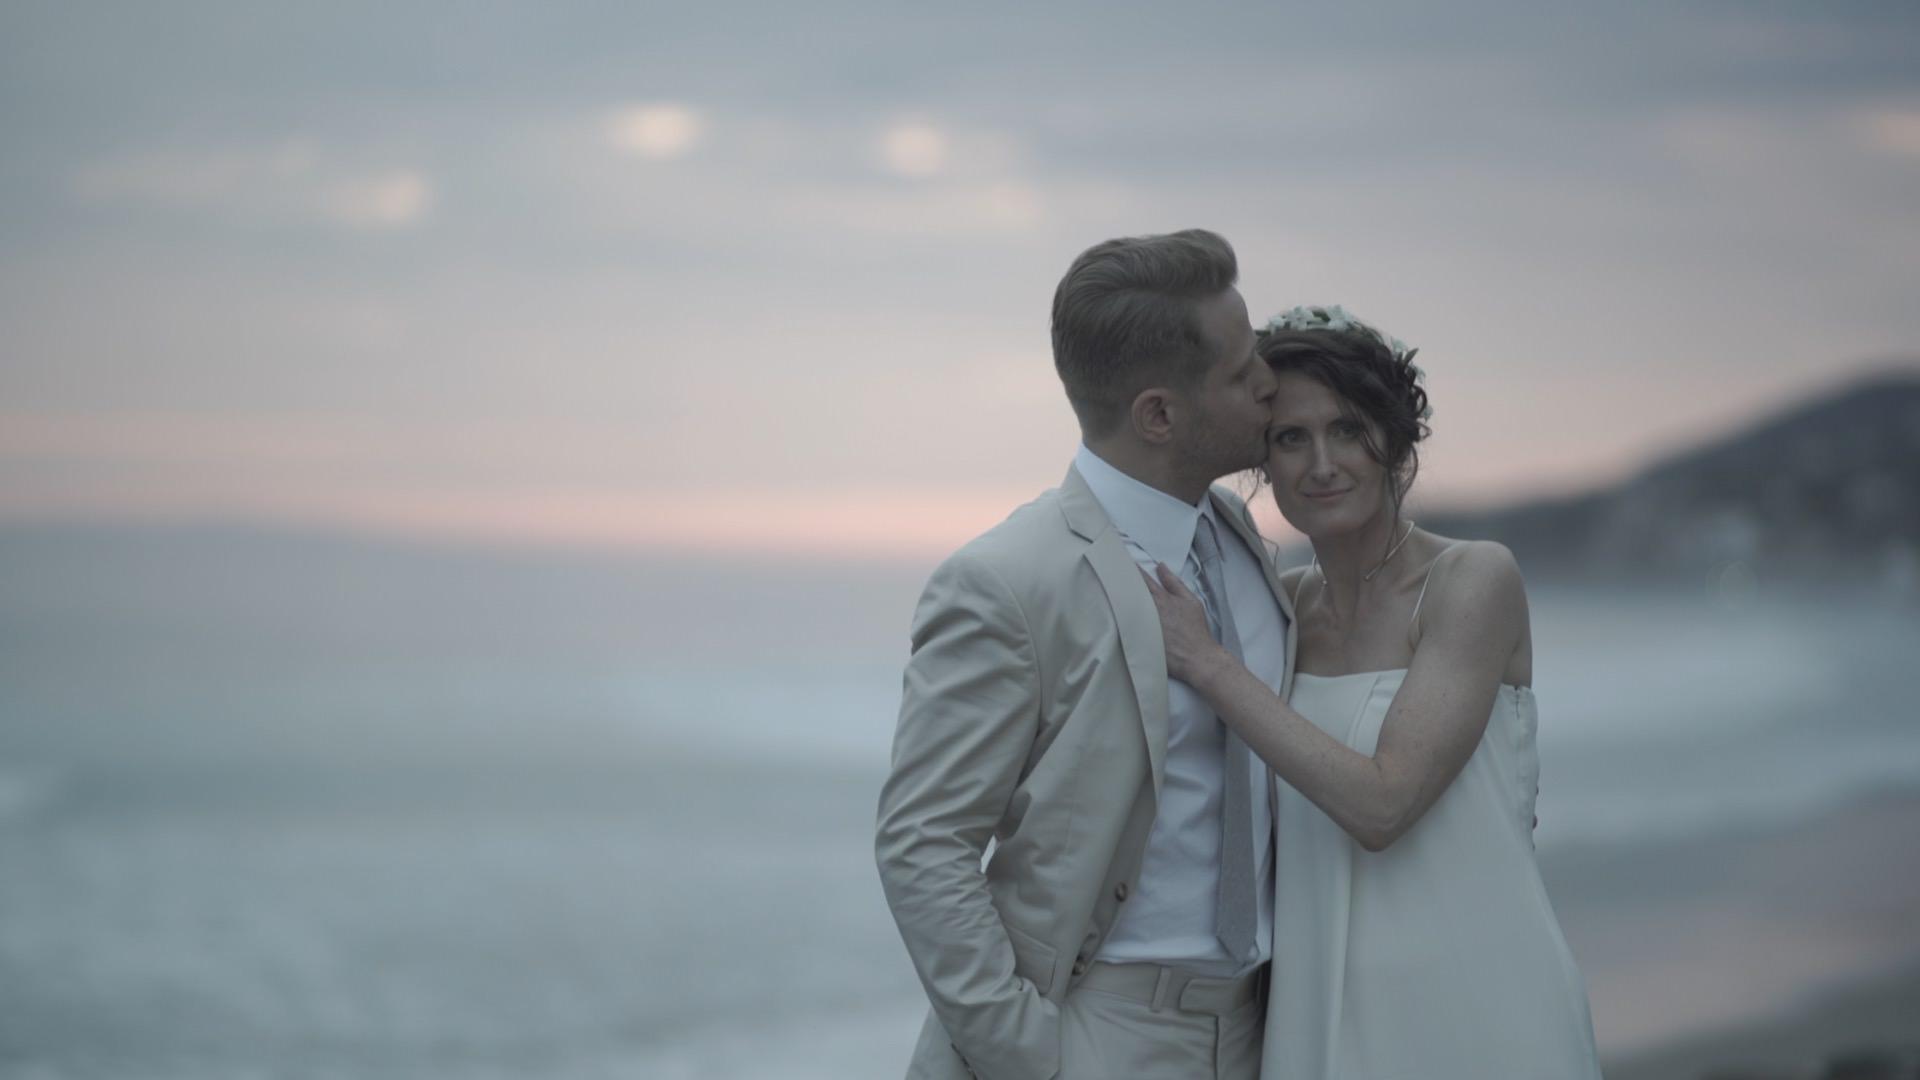 Malibu wedding videographer Philip White capturing a bride and groom on the beach